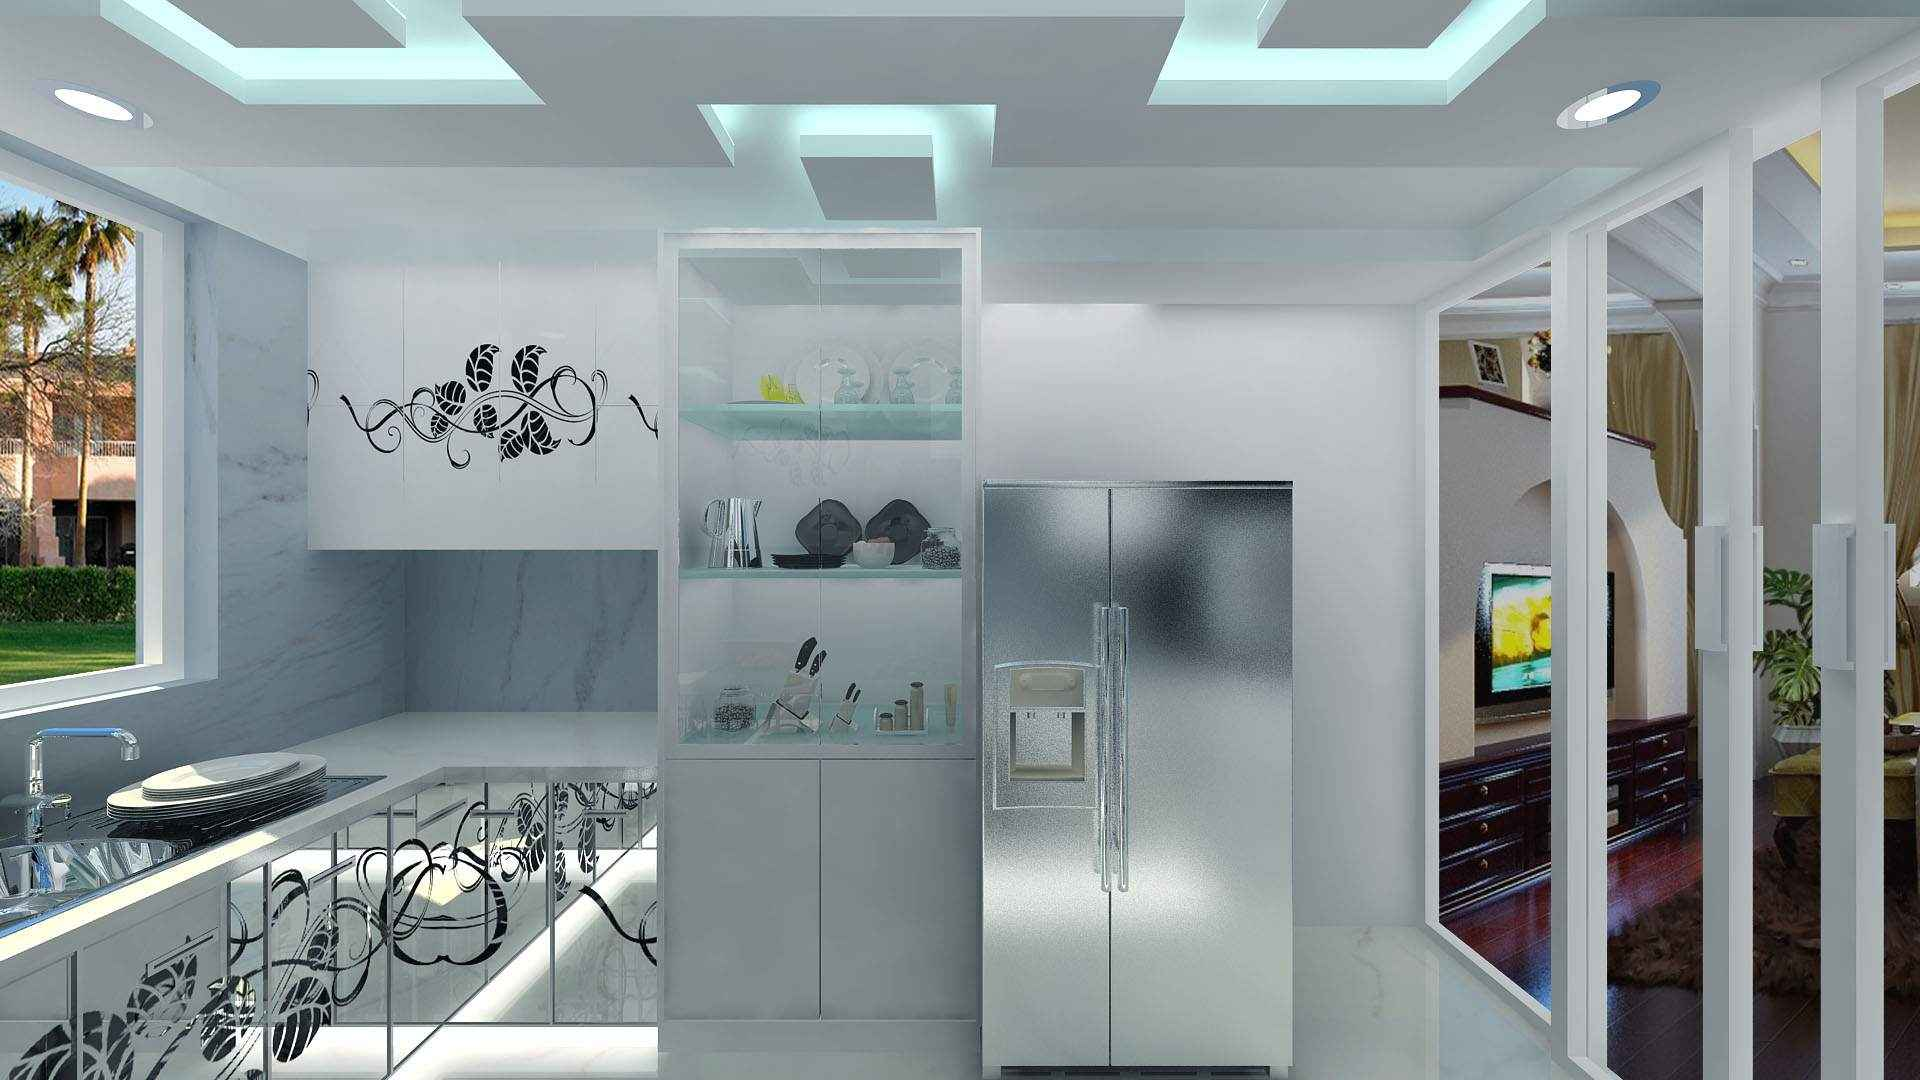 Interior Designs for Kitchens India | Interior Design Ideas for Kitchen